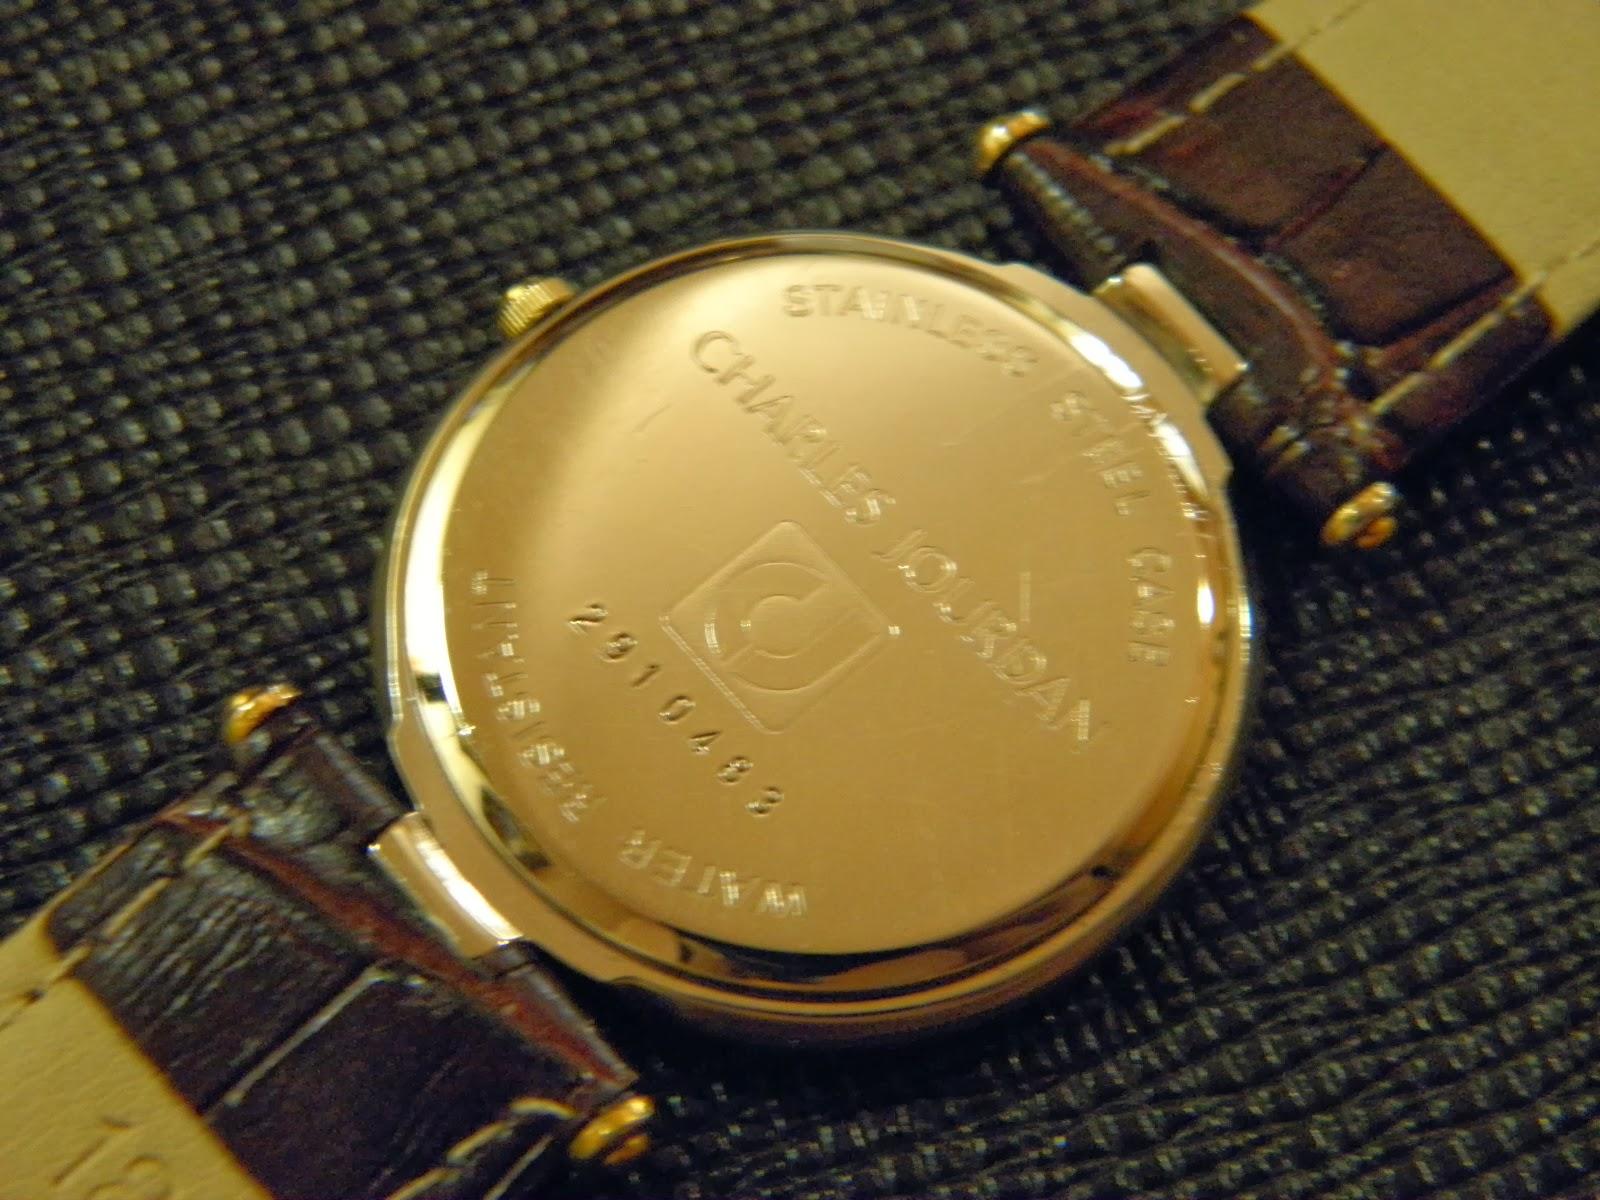 Kiosku Januari 2014 Rolex Gmt Kombinasi Swiss Mesin 2838 2 Movement Quartz Eta Dia 33 Mm W C Dial Putih Seperti Keramik Dengan Index Romawi Hitam Date Diangka 6 Perpaduan Hands Saja